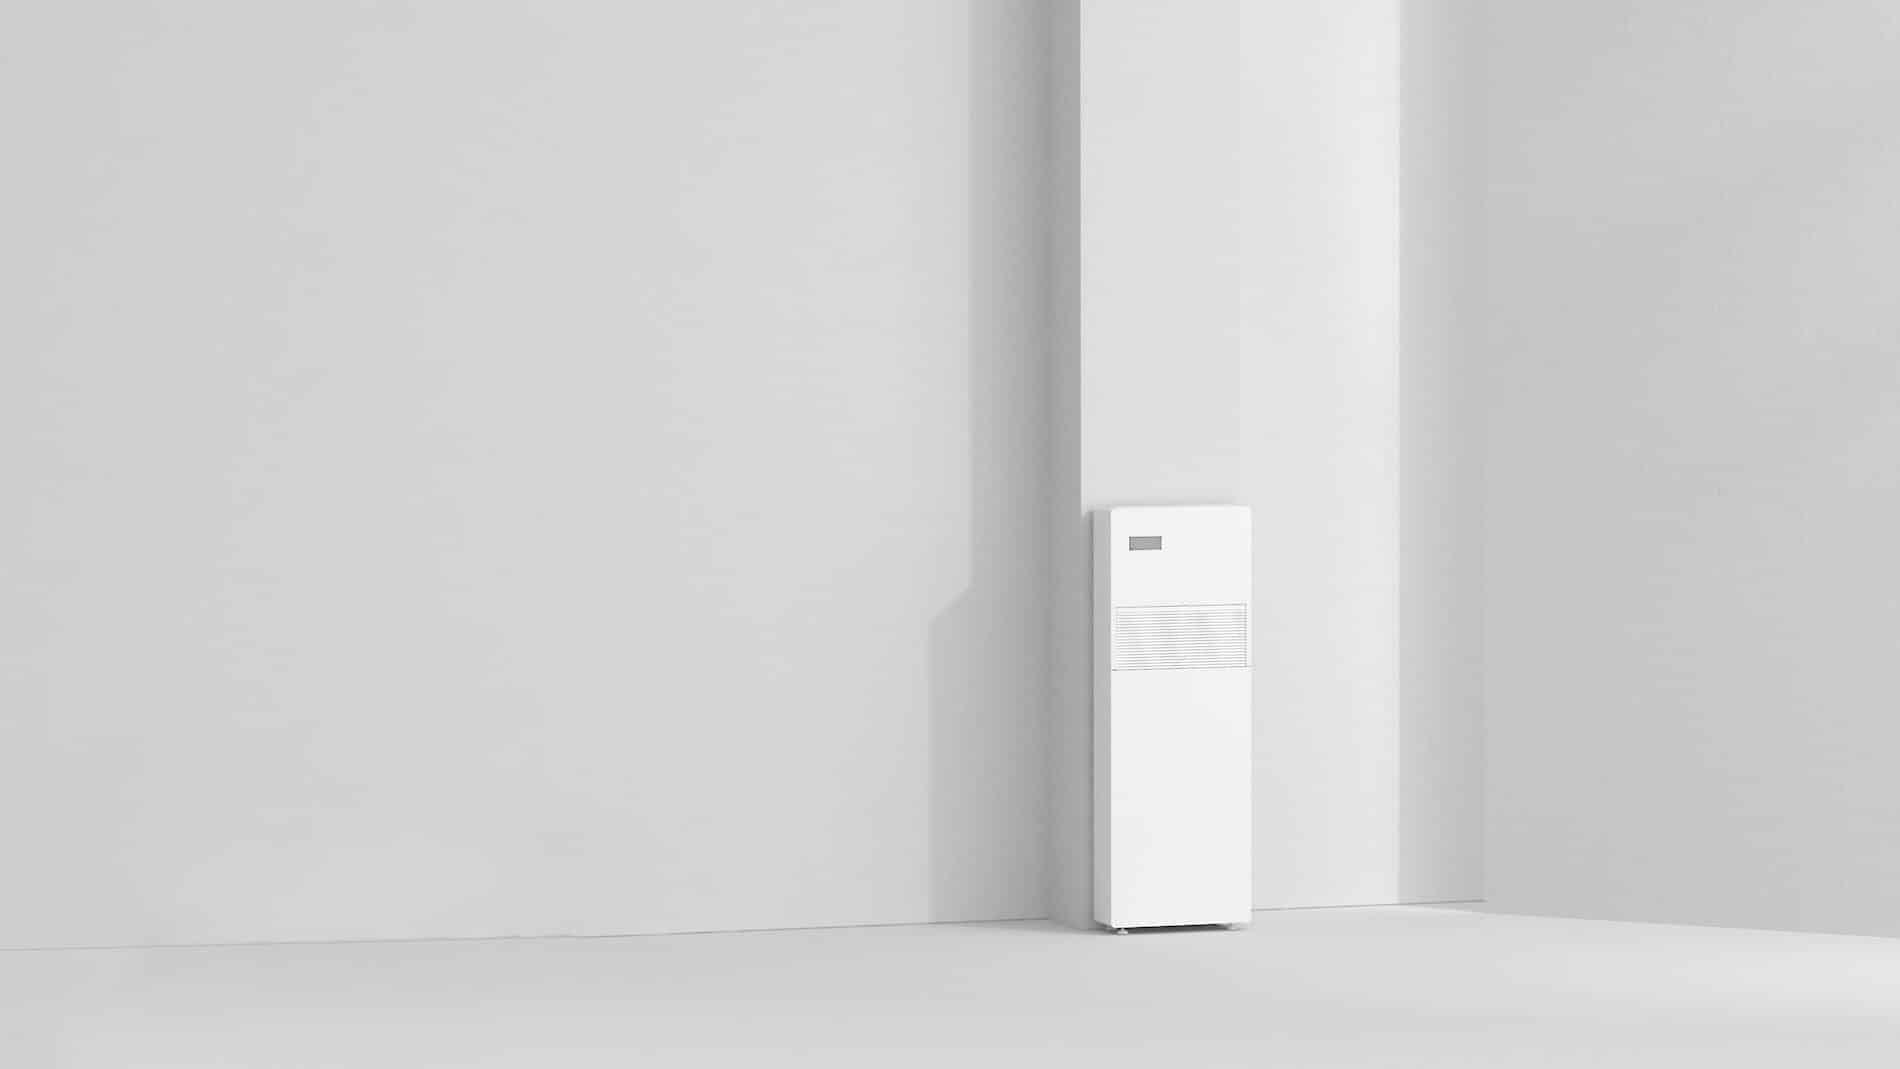 Green House Solutions zonnepanelen batterijopslag laadpalen airconditioning famiglia 2 0 verticale 19 9.1900x0